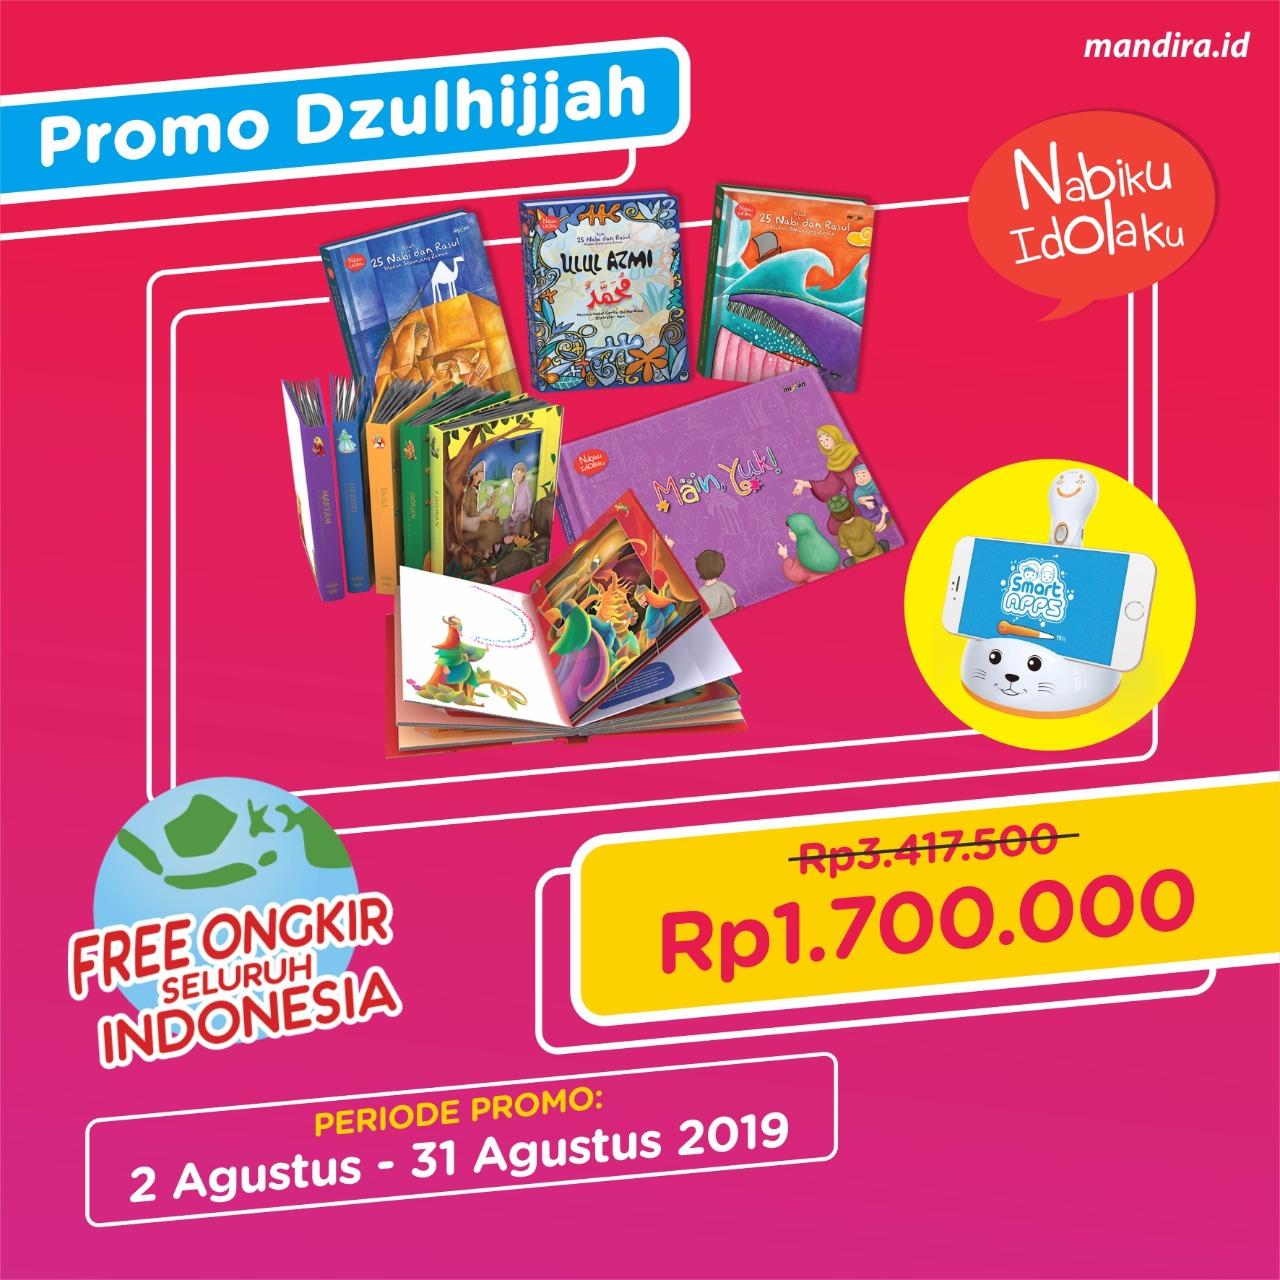 Promo NBI free smartpen